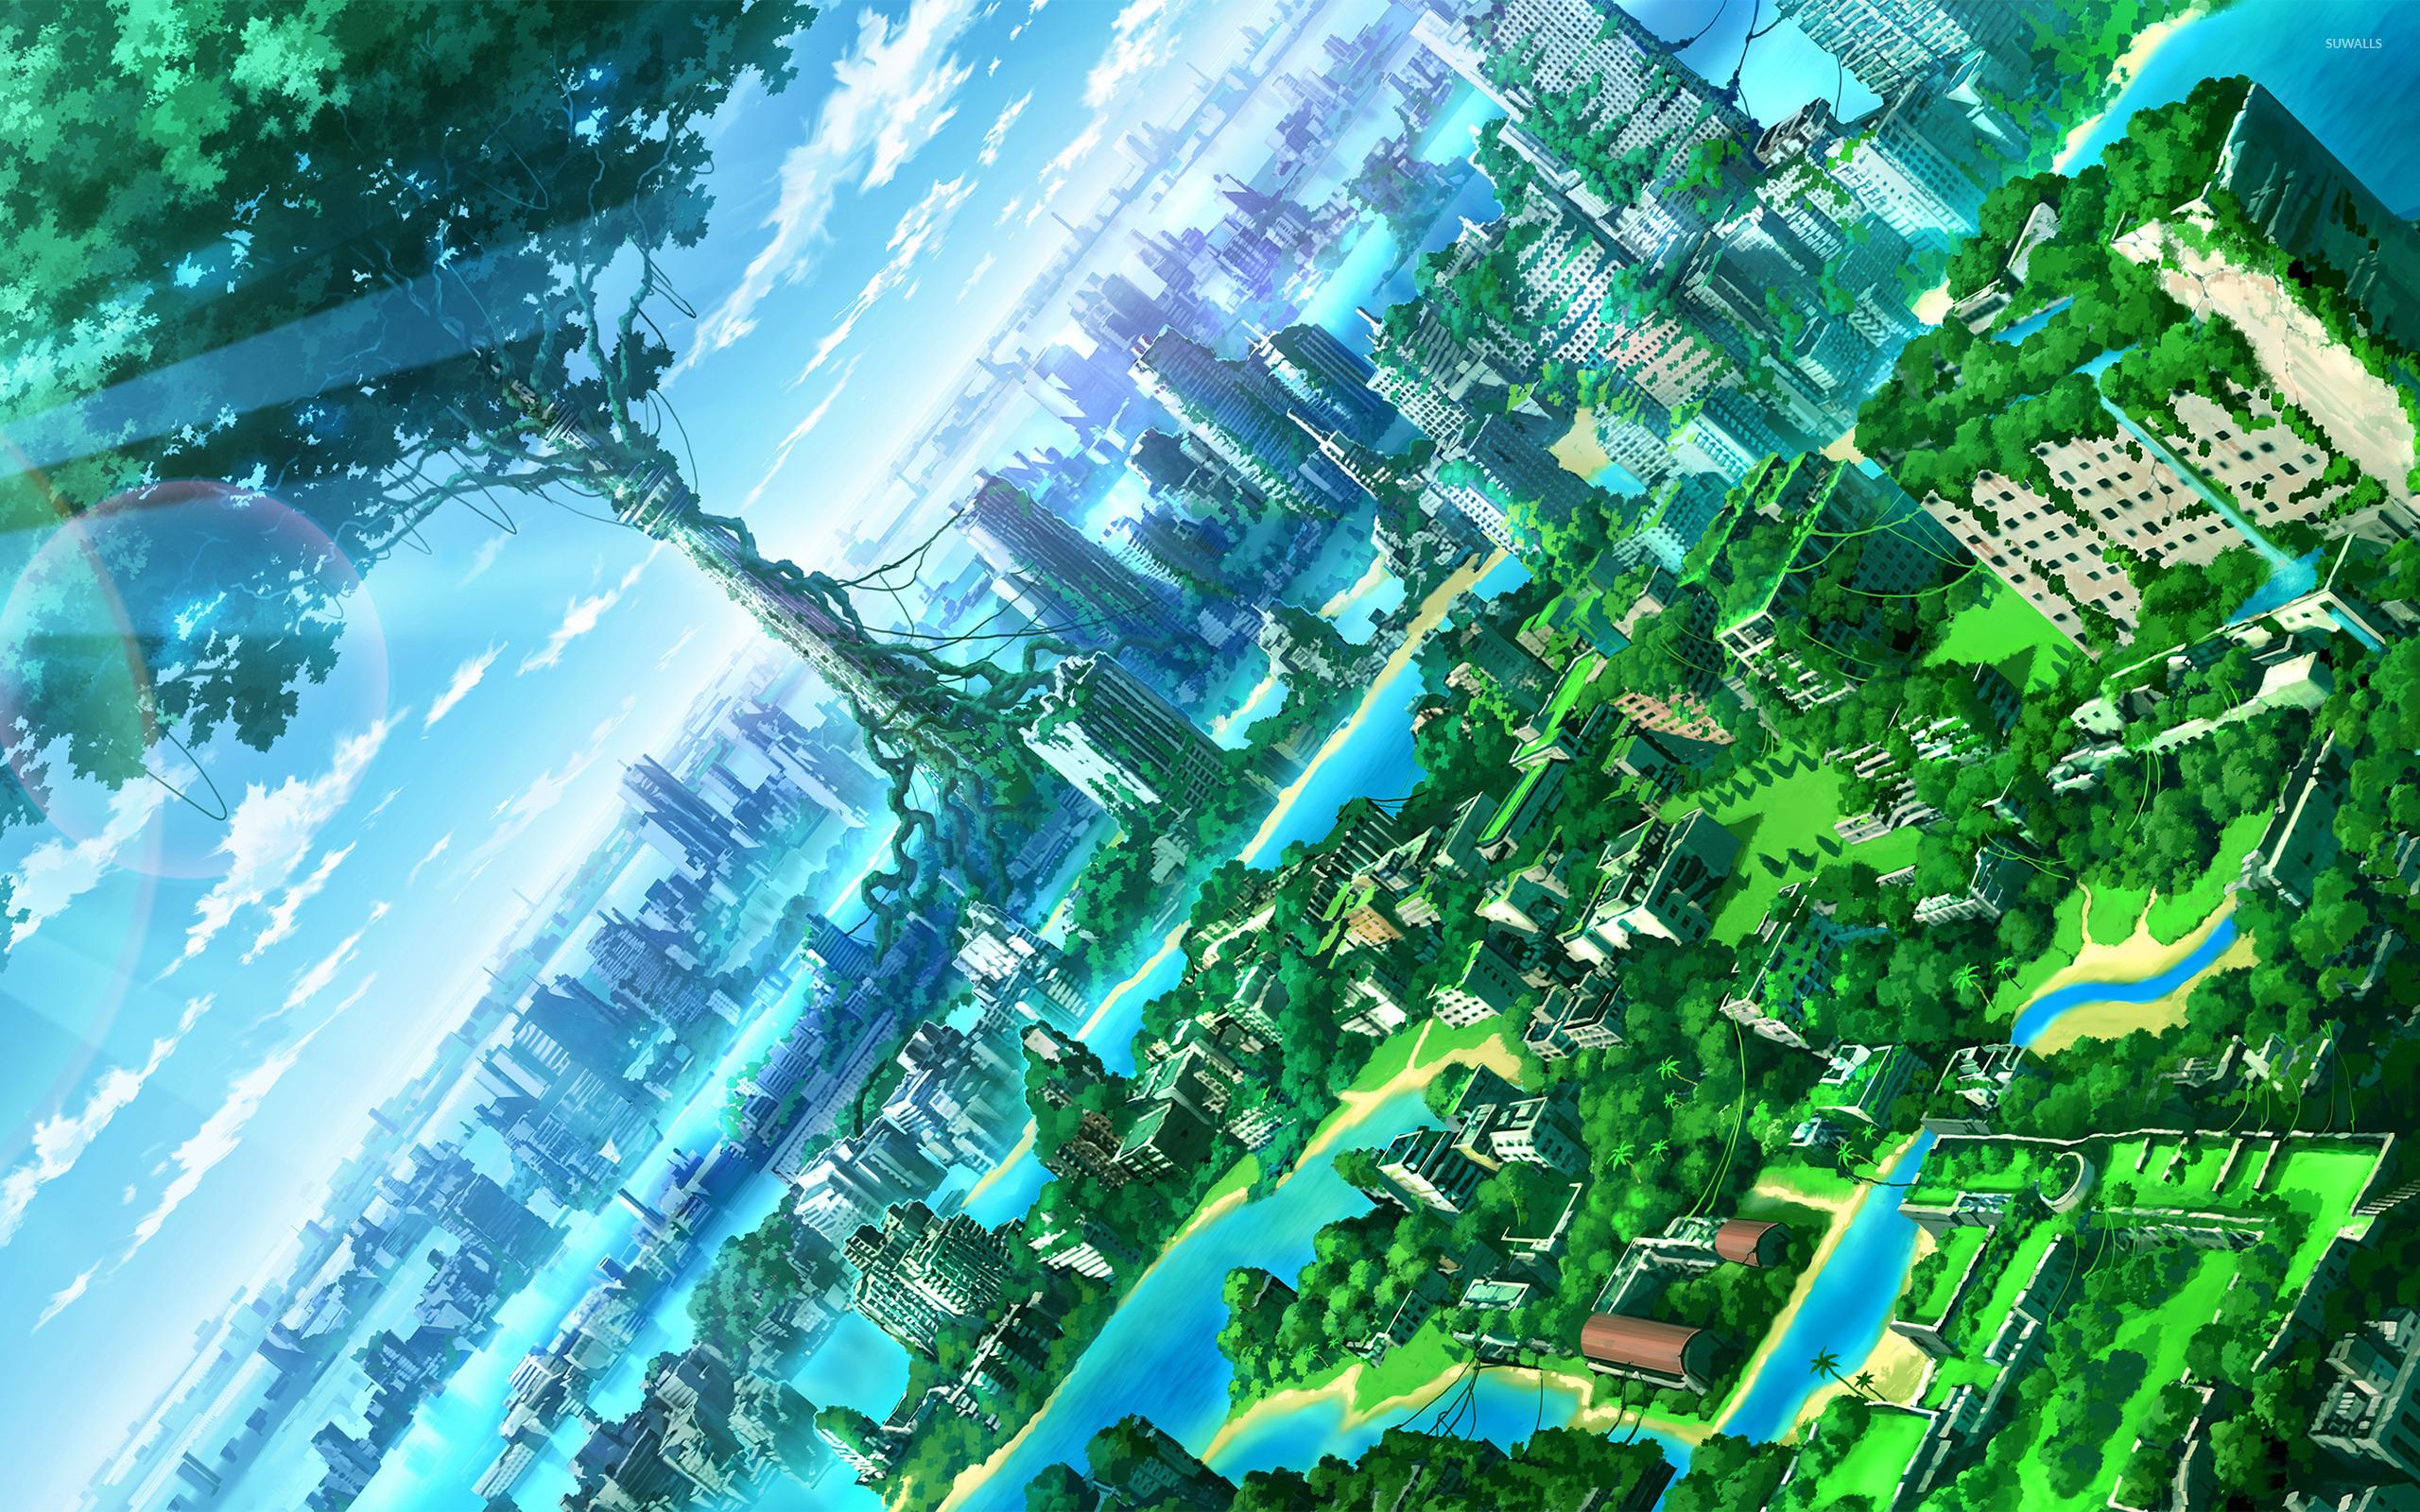 Green city 2 wallpaper - Anime wallpapers - #31389